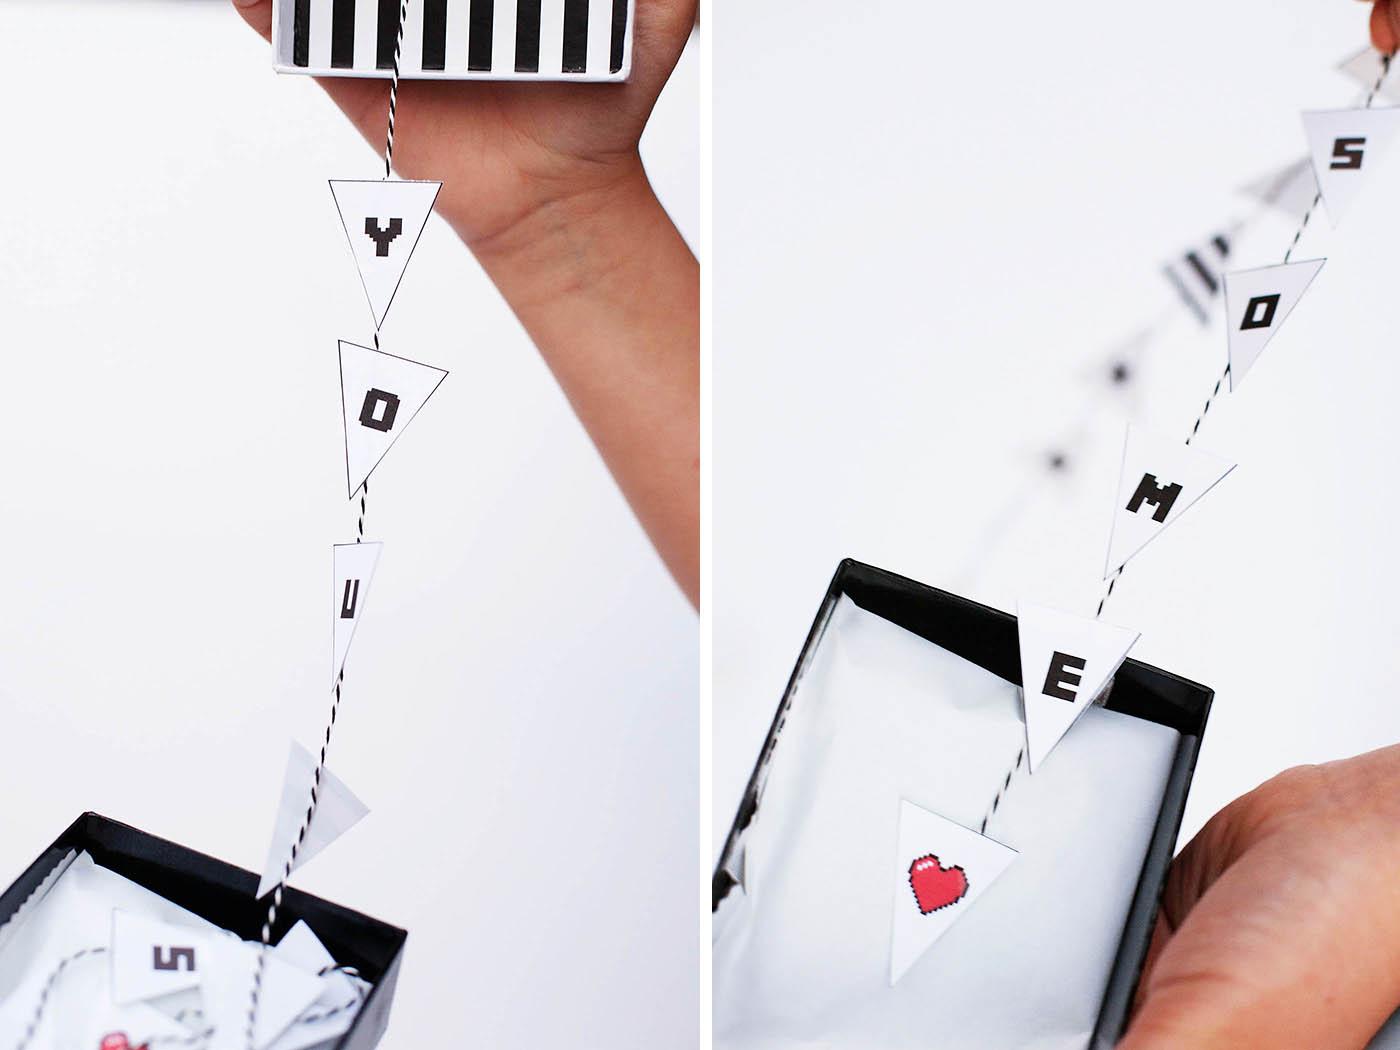 Printable pixelated Valentine's banners